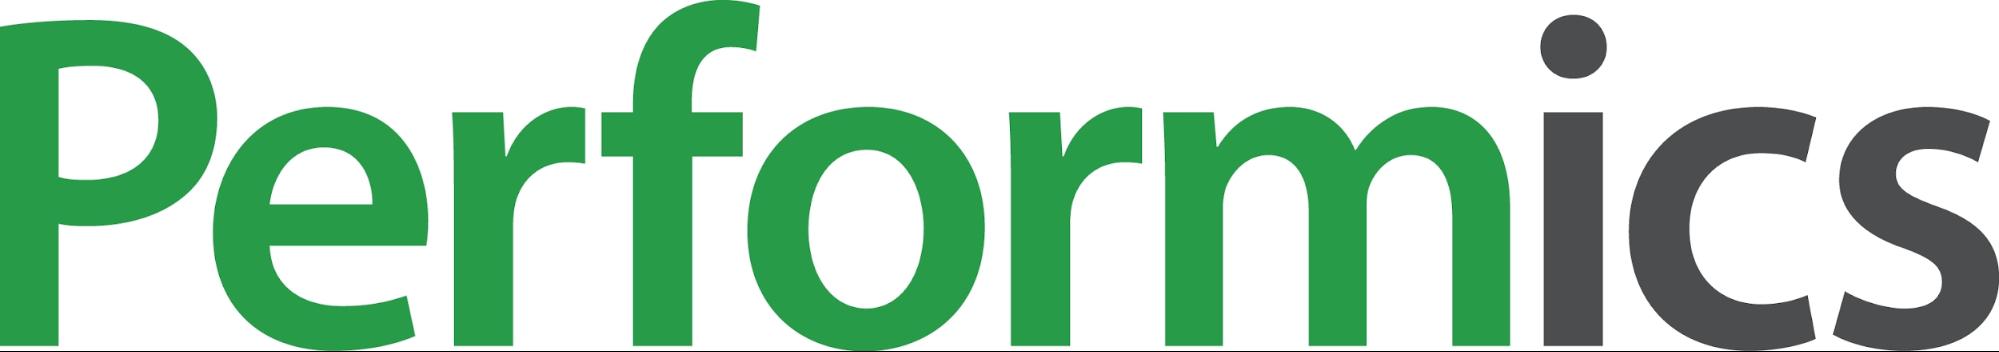 Performics' logo